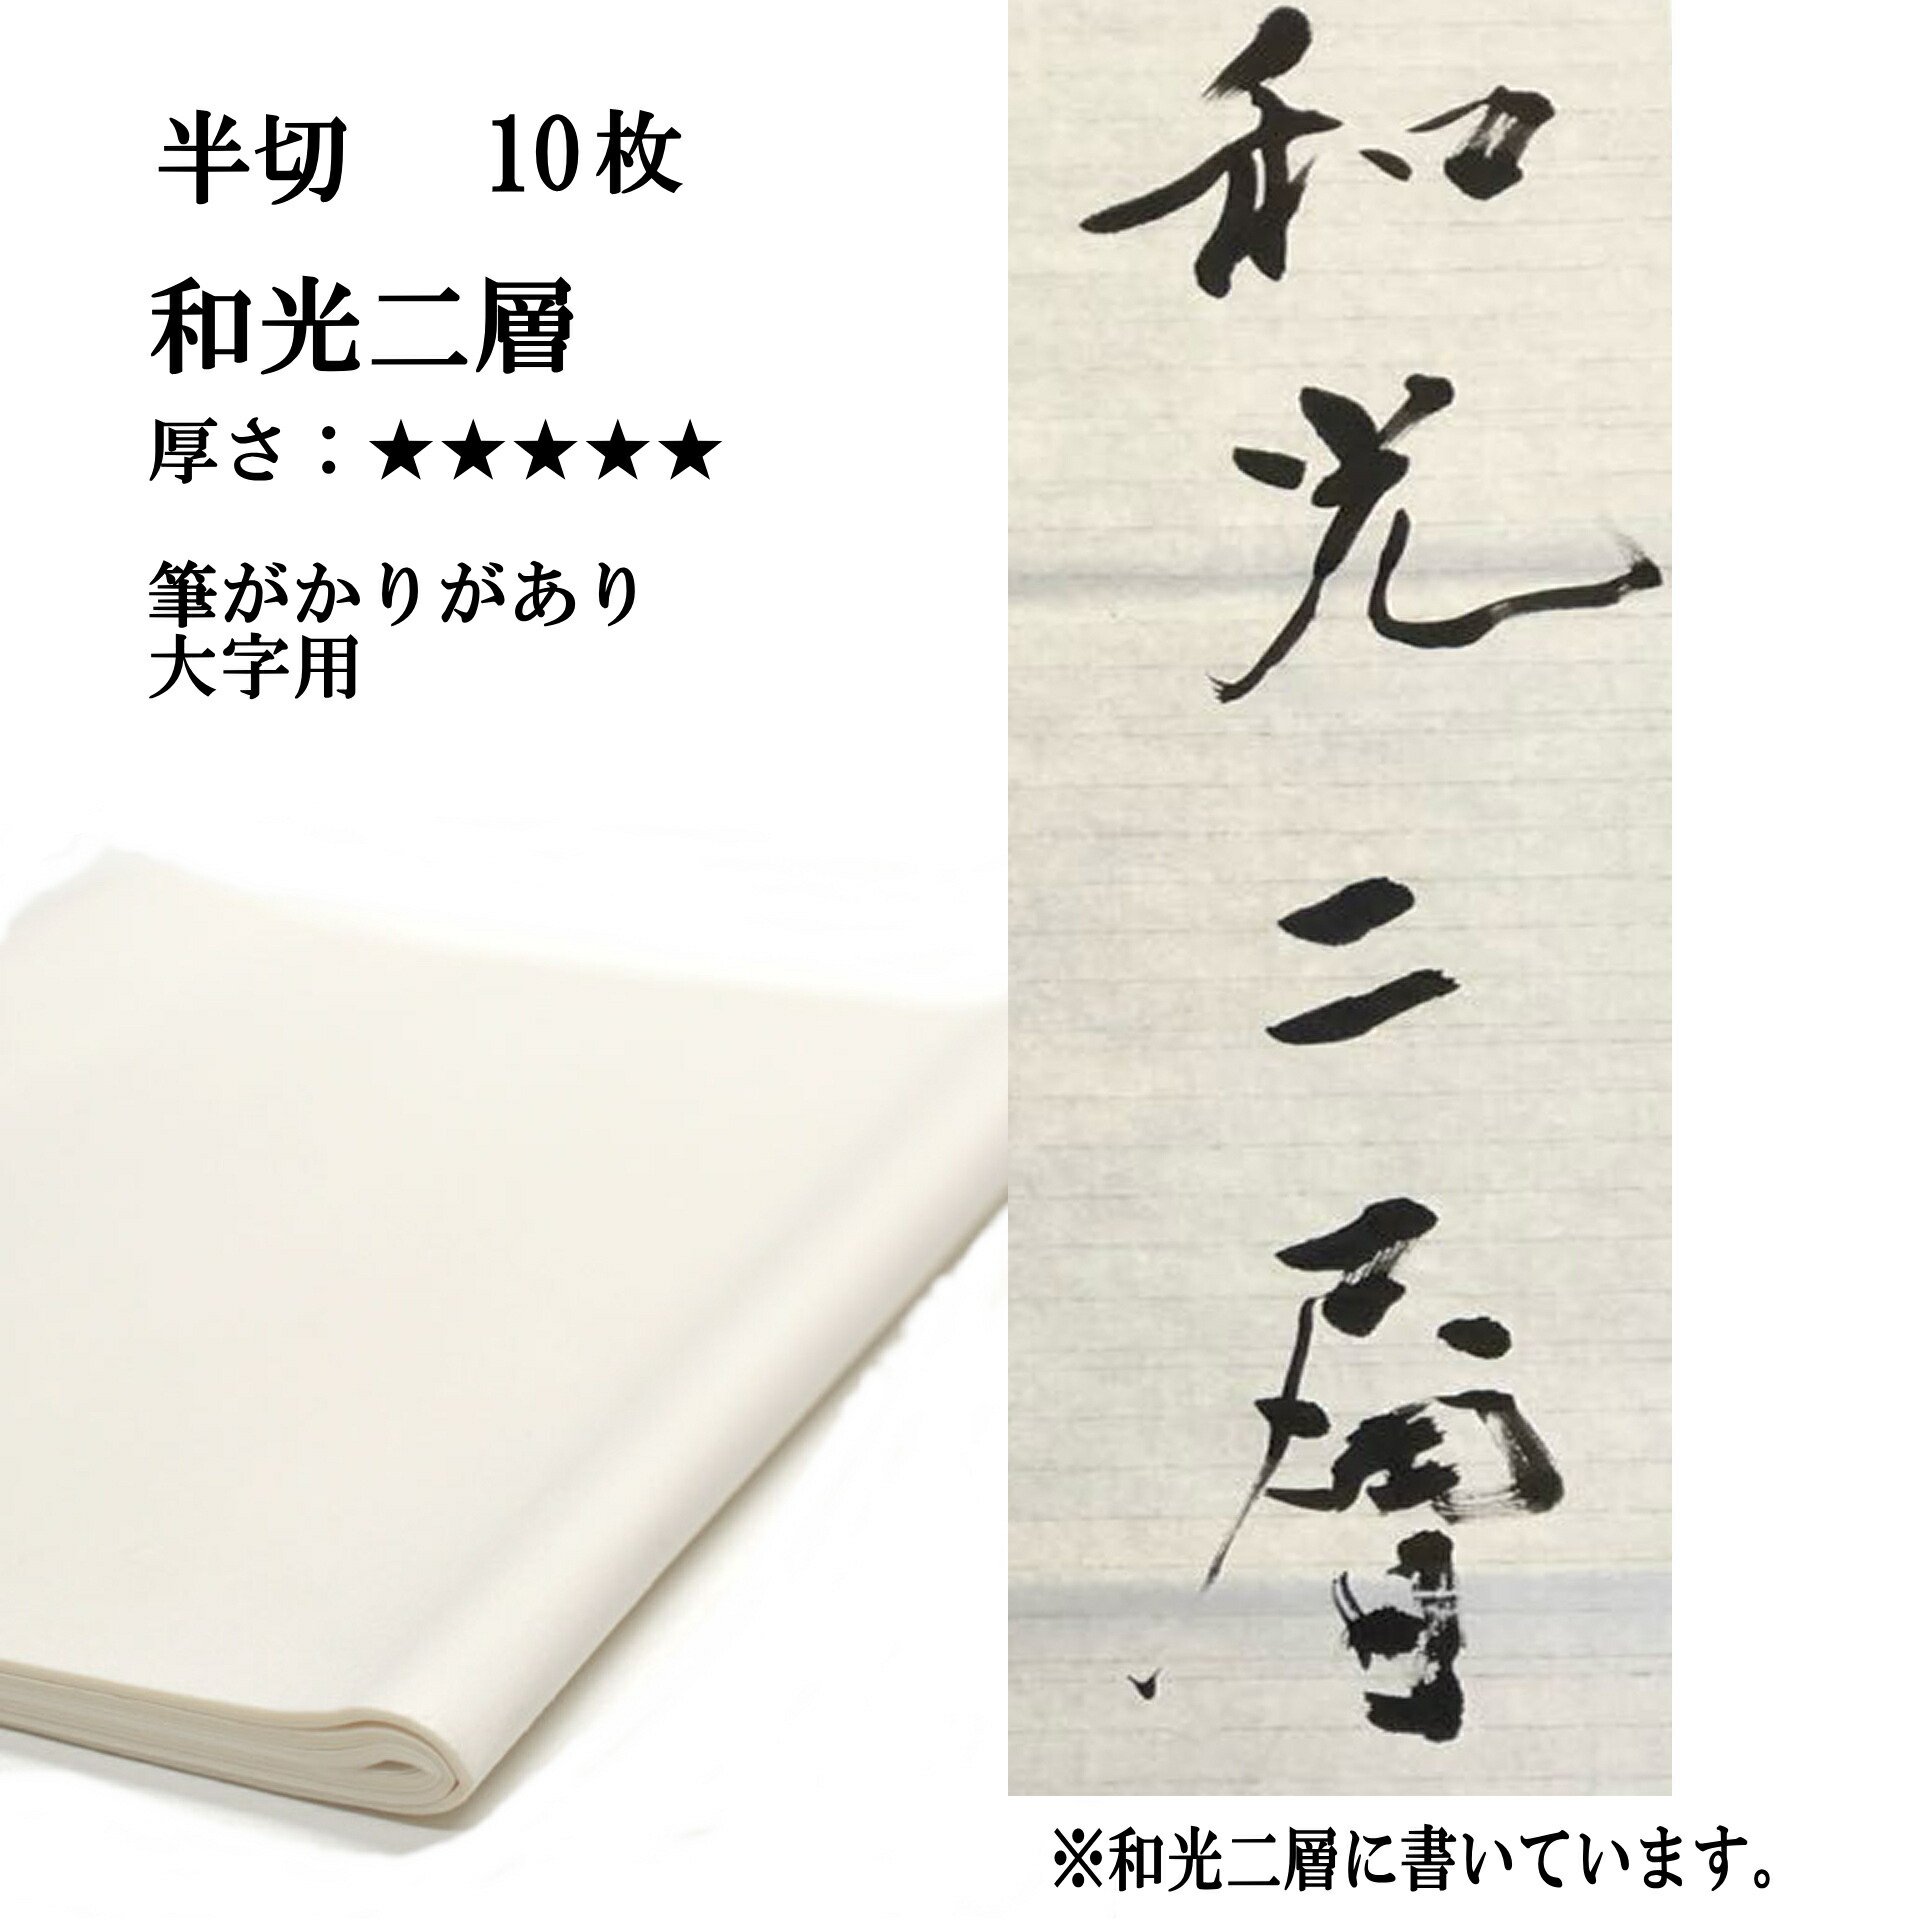 手漉き画仙紙 和光二層紙 10枚